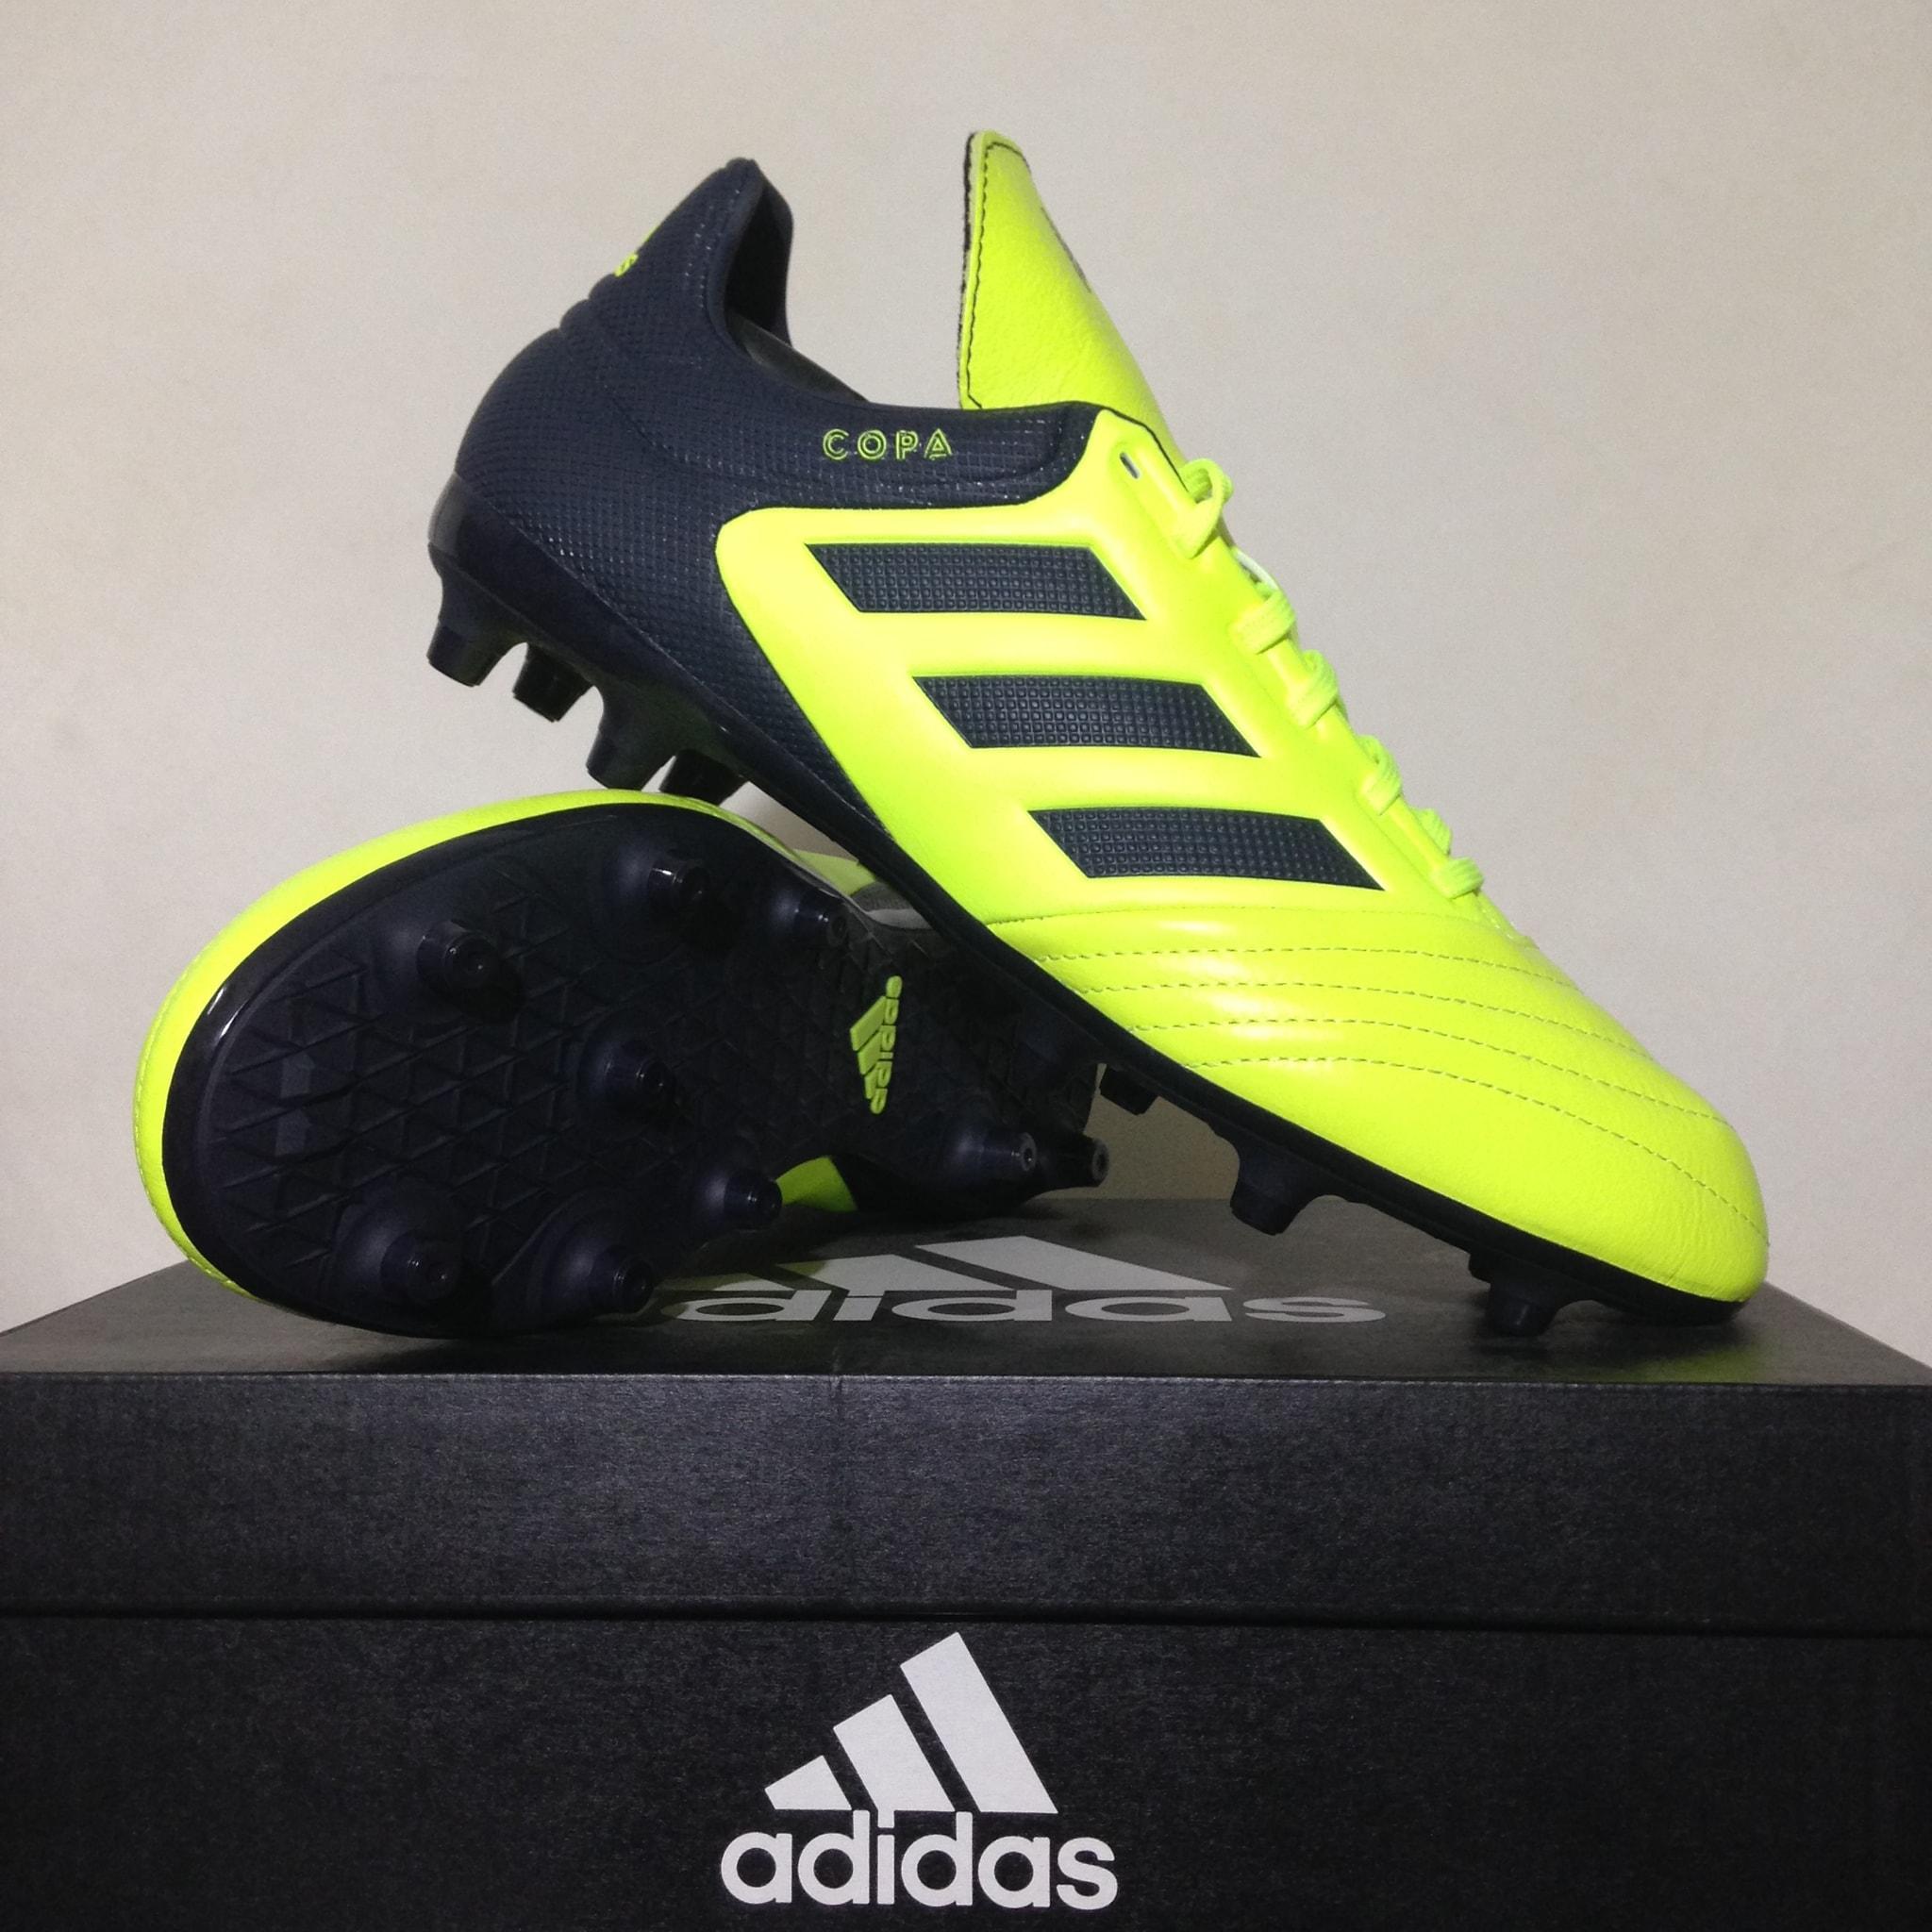 Jual Sepatu Bola Adidas Copa 17 3 Fg Solar Yellow Black S77143 f5e1dc41c3